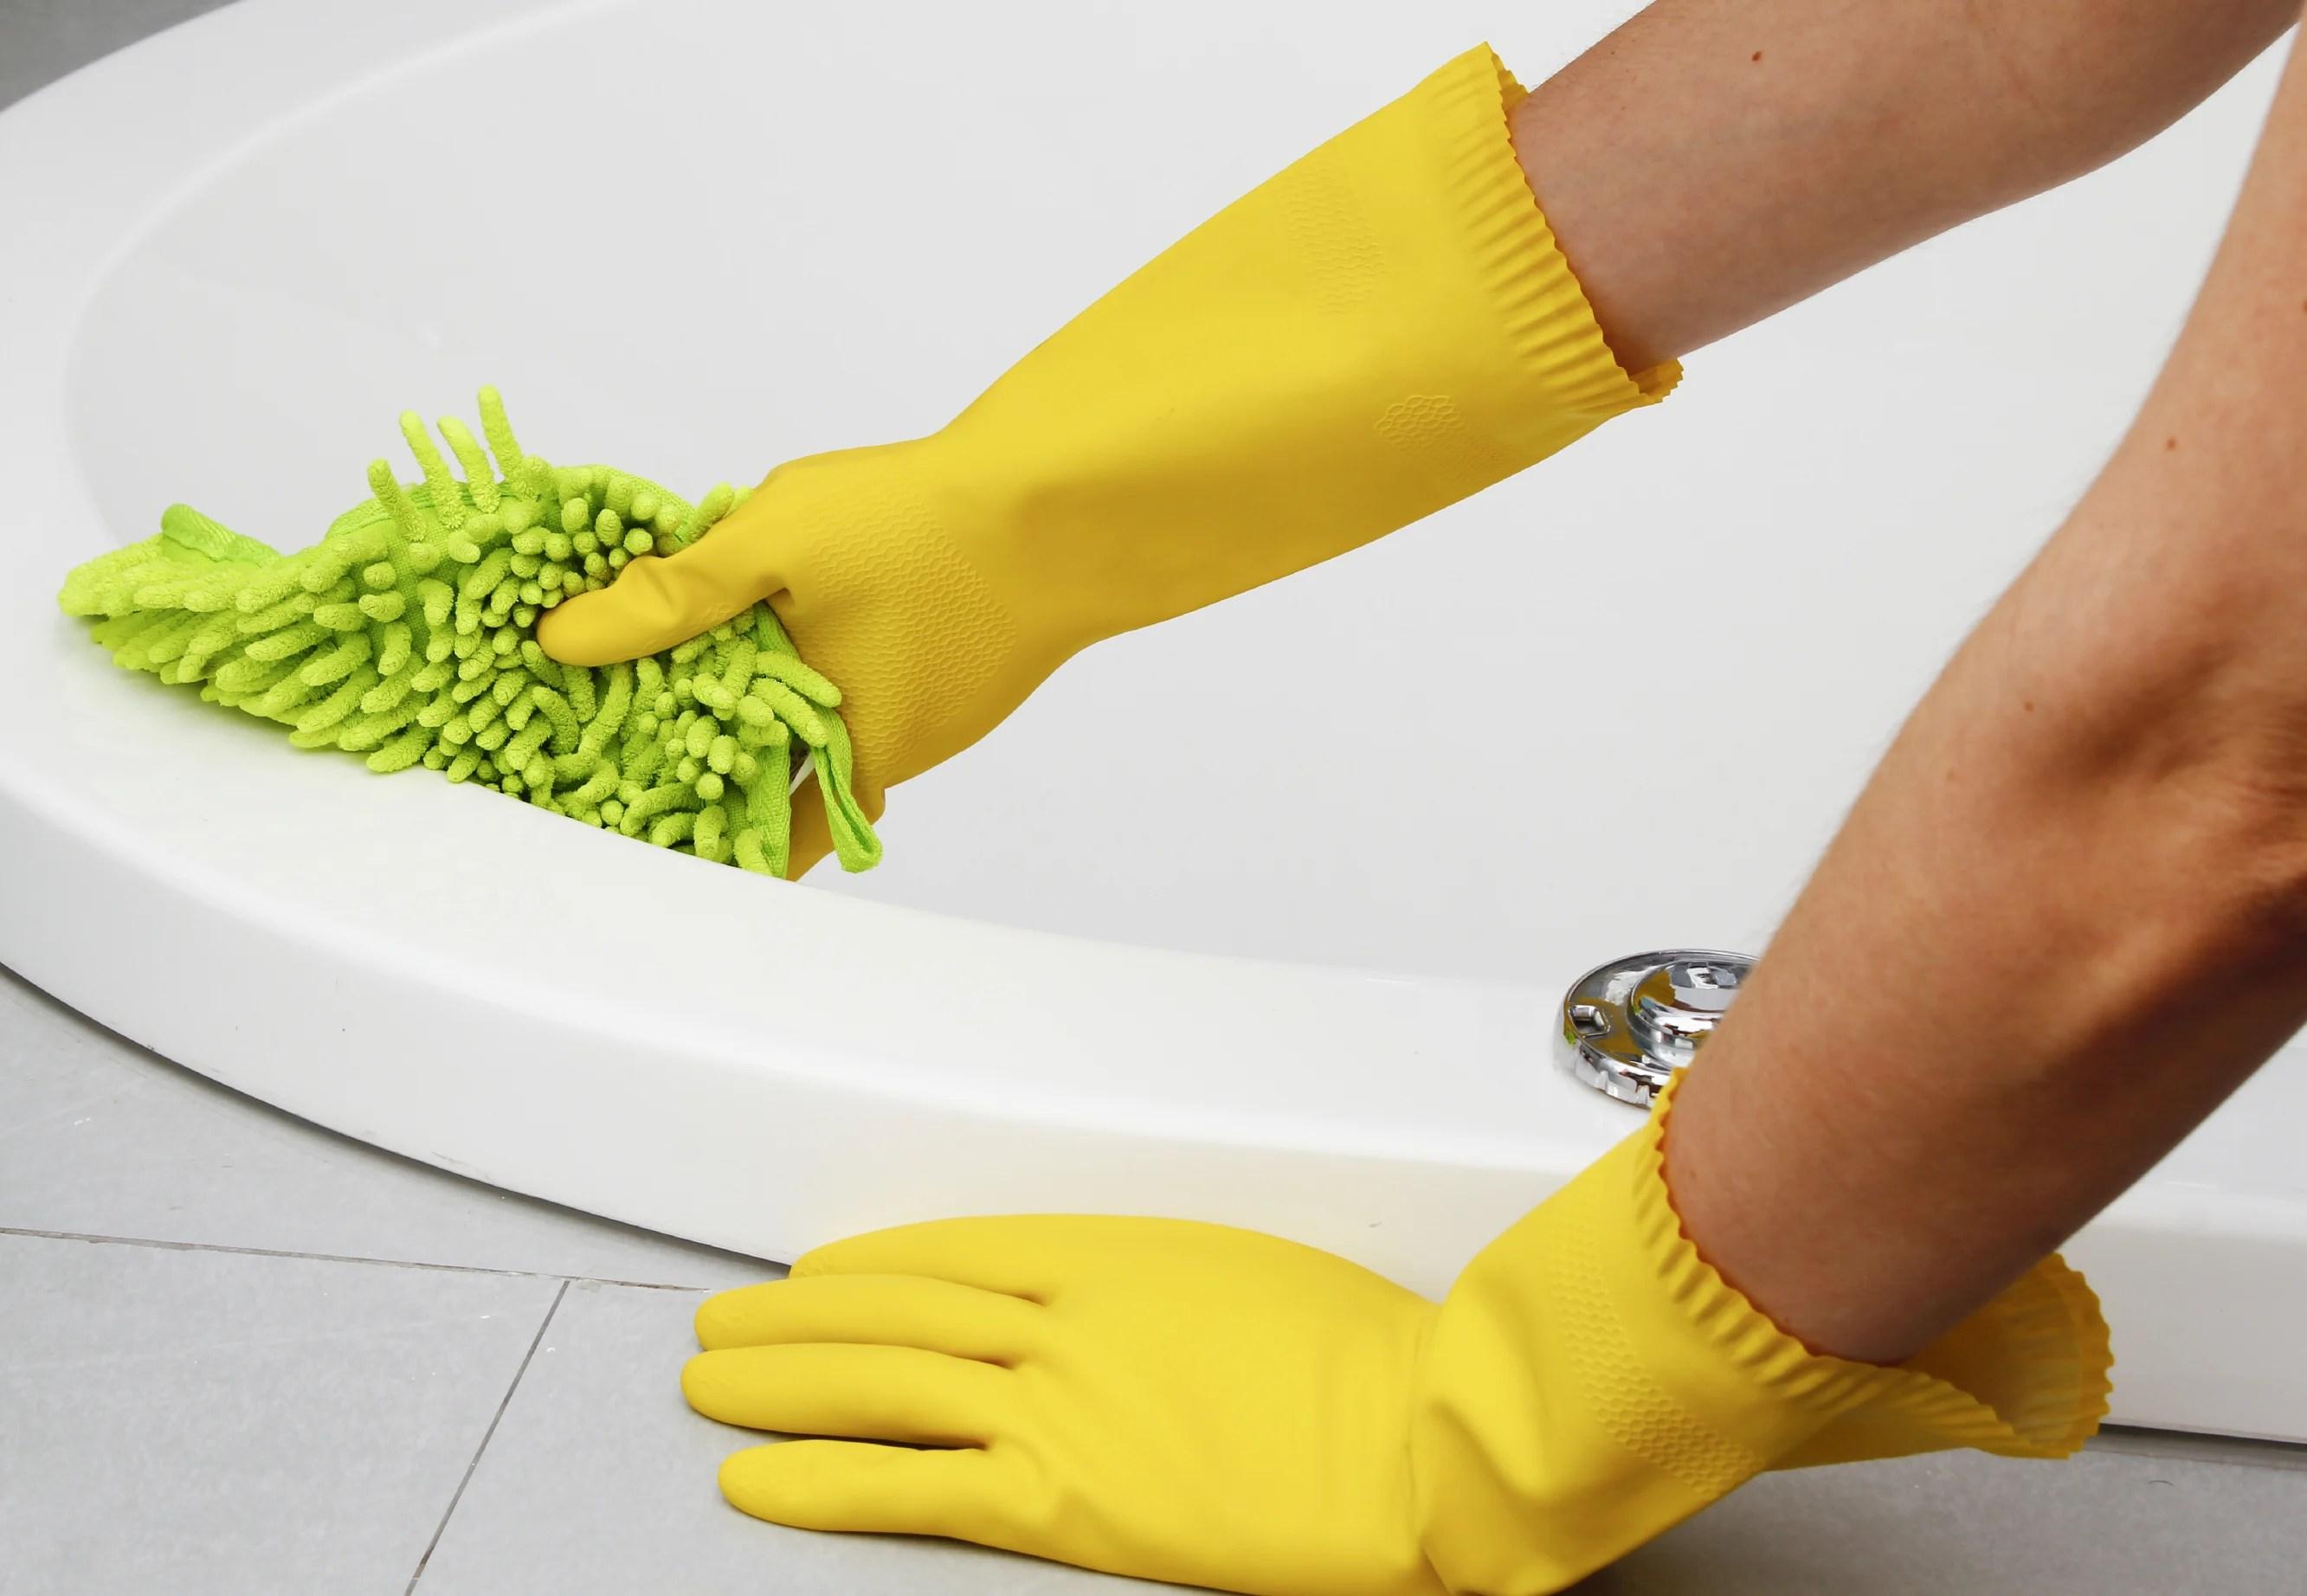 Remodelaholic How To Clean A Bathroom Using Clorox Bleach - To clean the bathroom